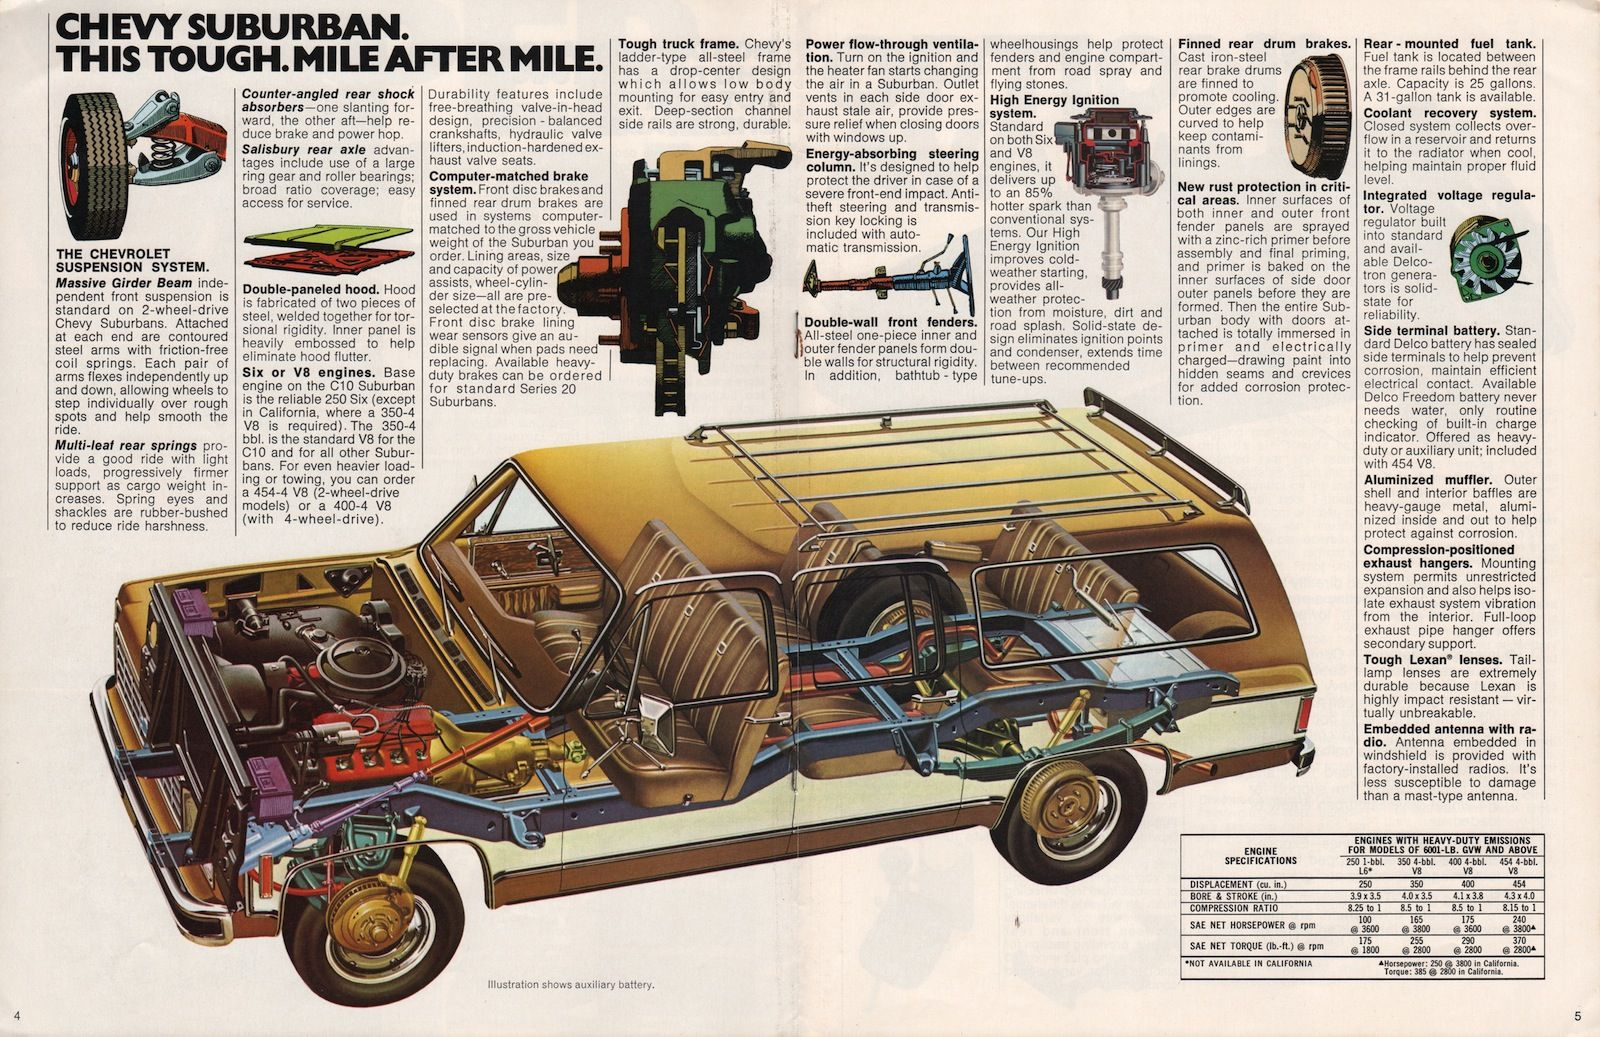 1976 Chevrolet Suburban Diagram From Brochure Garage Pinterest Engine